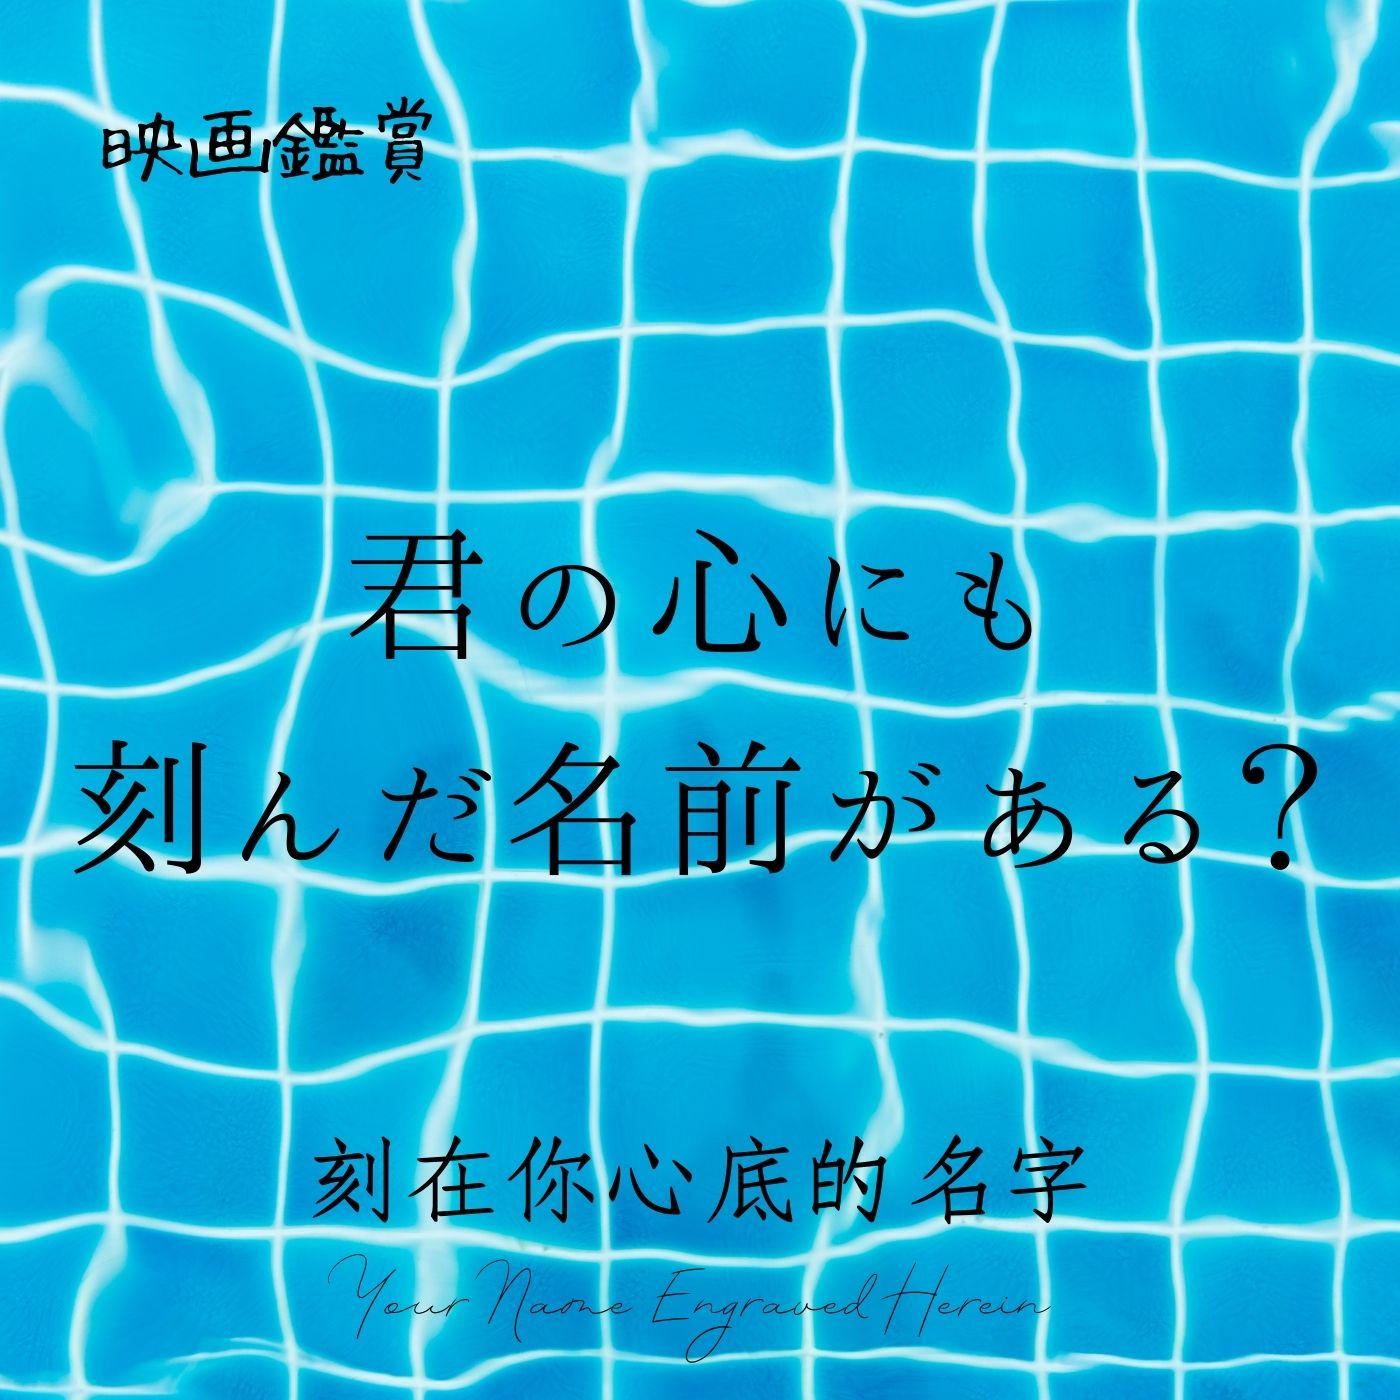 EP2 - (JP)【映画鑑賞】刻在你心底的名字(君の心に刻んだ名前)−時代背景について